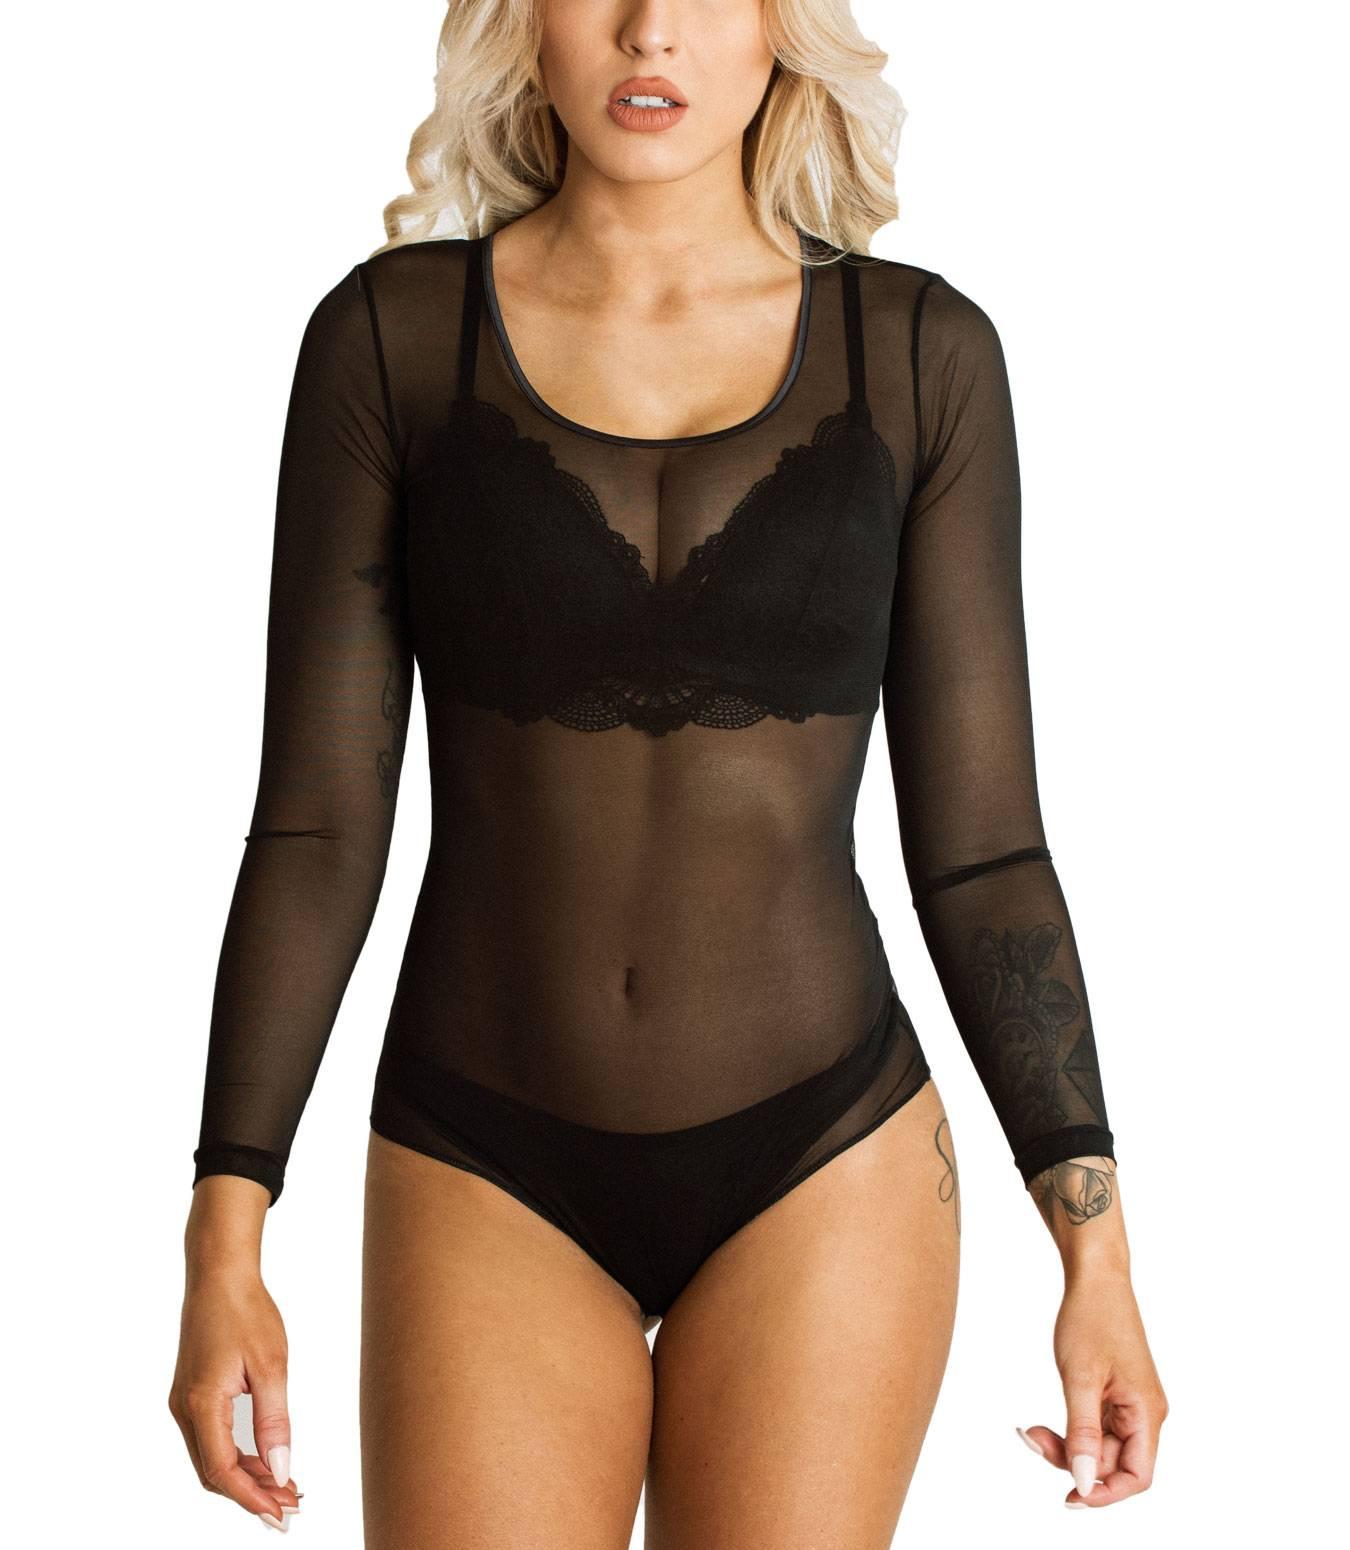 Kefali-Transparant-Damenbody-Tuellbody-Rundhals-Lingerie-Mesh-Bodysuit-Schwarz